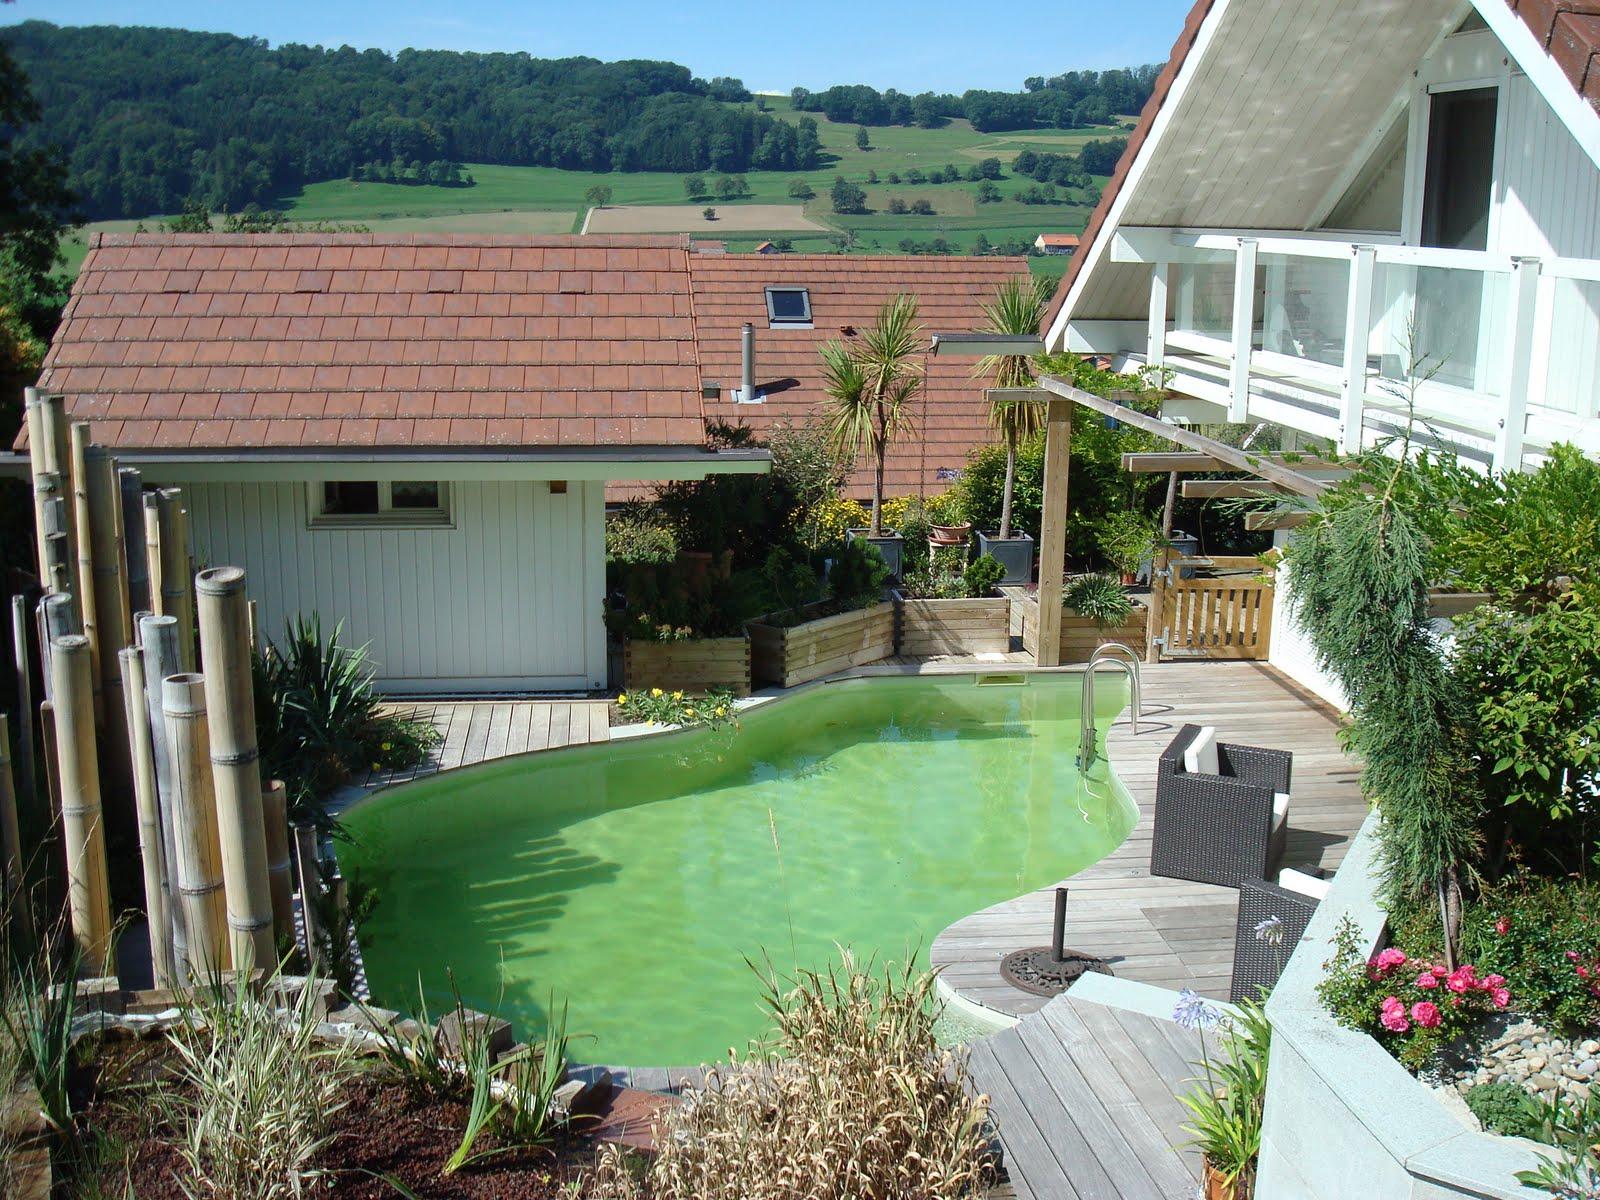 paysagiste et am nagement de jardin thonon et annemasse terrasses. Black Bedroom Furniture Sets. Home Design Ideas